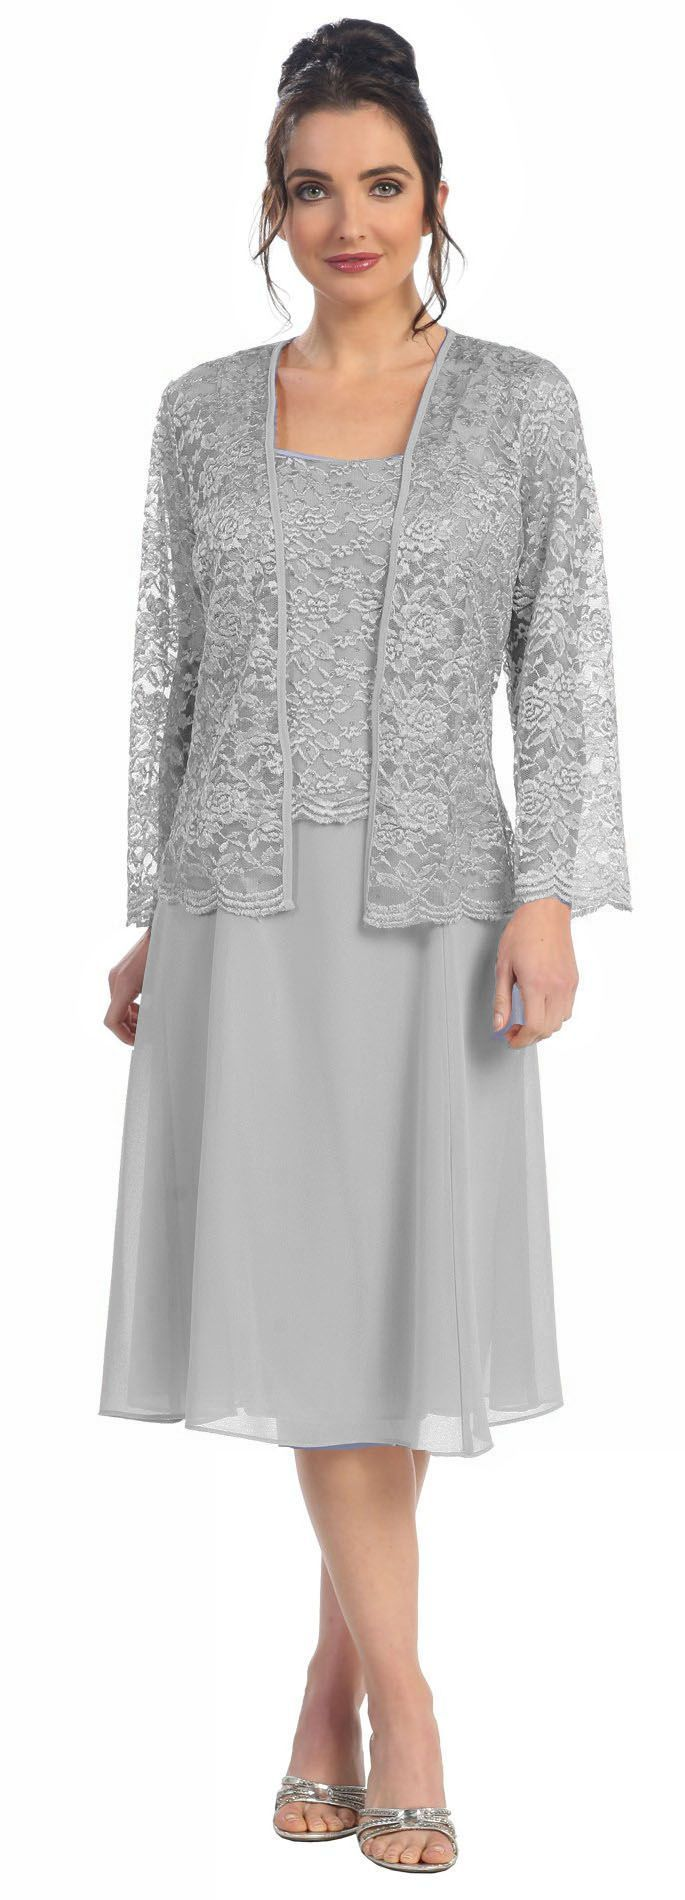 Grandmother of the Bride Dresses | Evening Wedding Outfit Grandmother Of The Bride Dresses